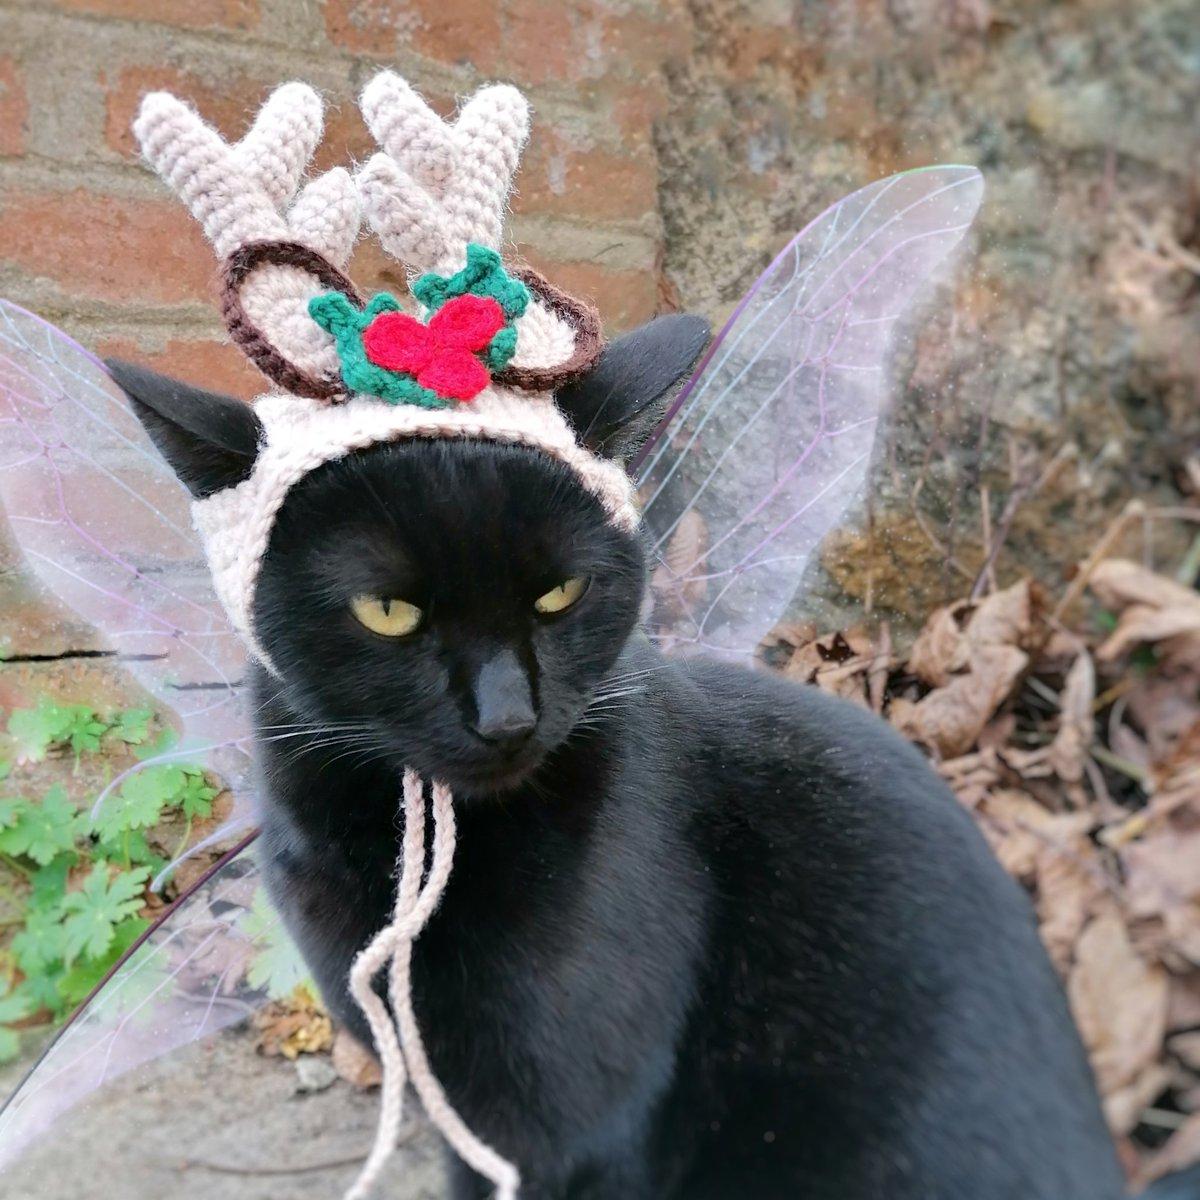 Reindeer cat 🎄 Check out: https://t.co/JmGxYqM9sC #cats #CatsOfTwitter #Caturday #Christmas #ChristmasTree #NewYear #costume #Halloween2020 #dogsoftwitter #CuteCats #cutenessOVERLOAD #funniest #catsincostume2020 #costume #BlackCat #BlackCatsDay https://t.co/VlGMmuJmZb